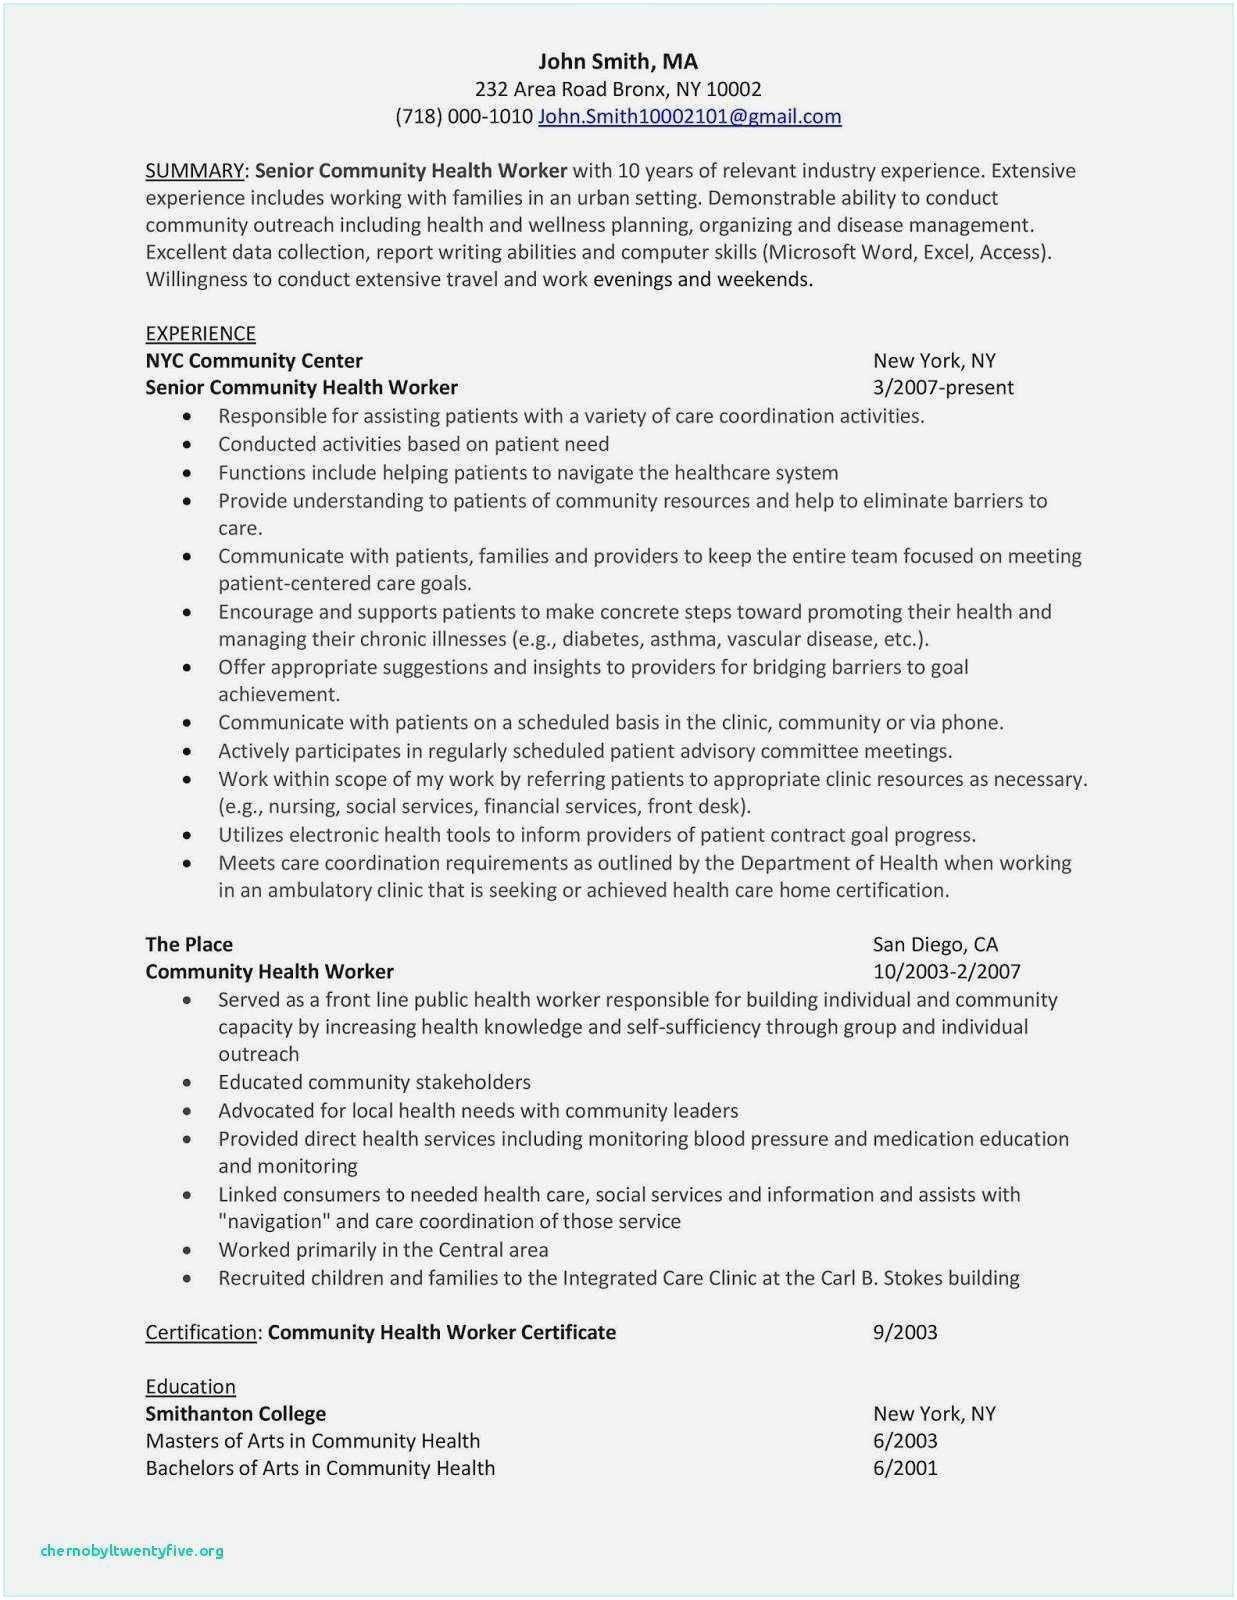 Reach Certificate Of Compliance Template Lovely Free 50 Certificate Pliance Template Download